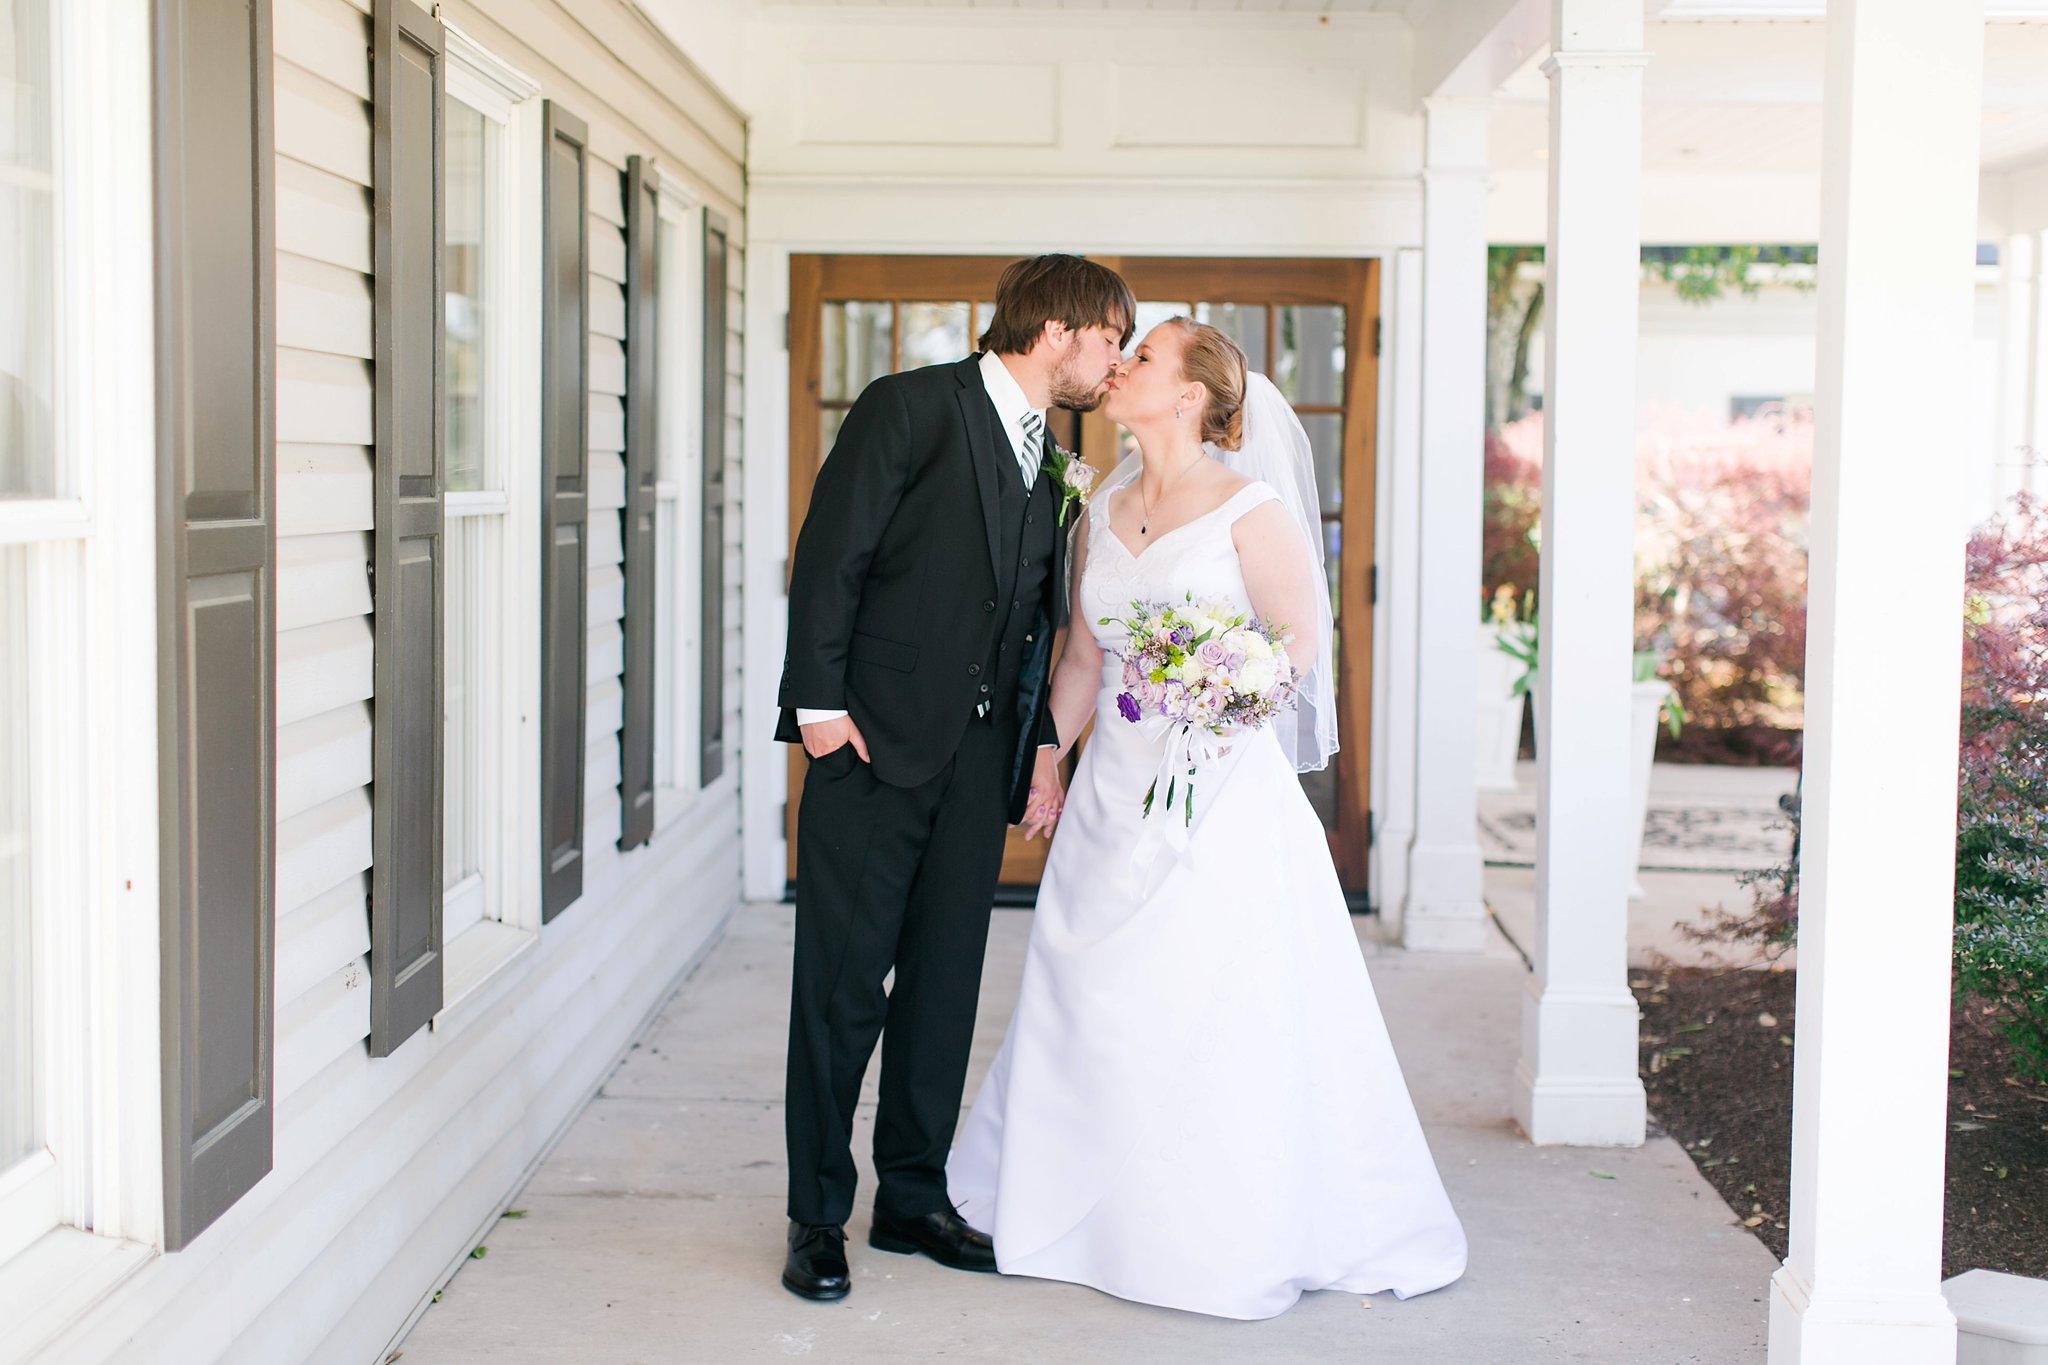 Chantilly National Golf Club Wedding Photos Virginia Wedding Photographer Megan Kelsey Photography Mary Beth and Nathan-39.jpg